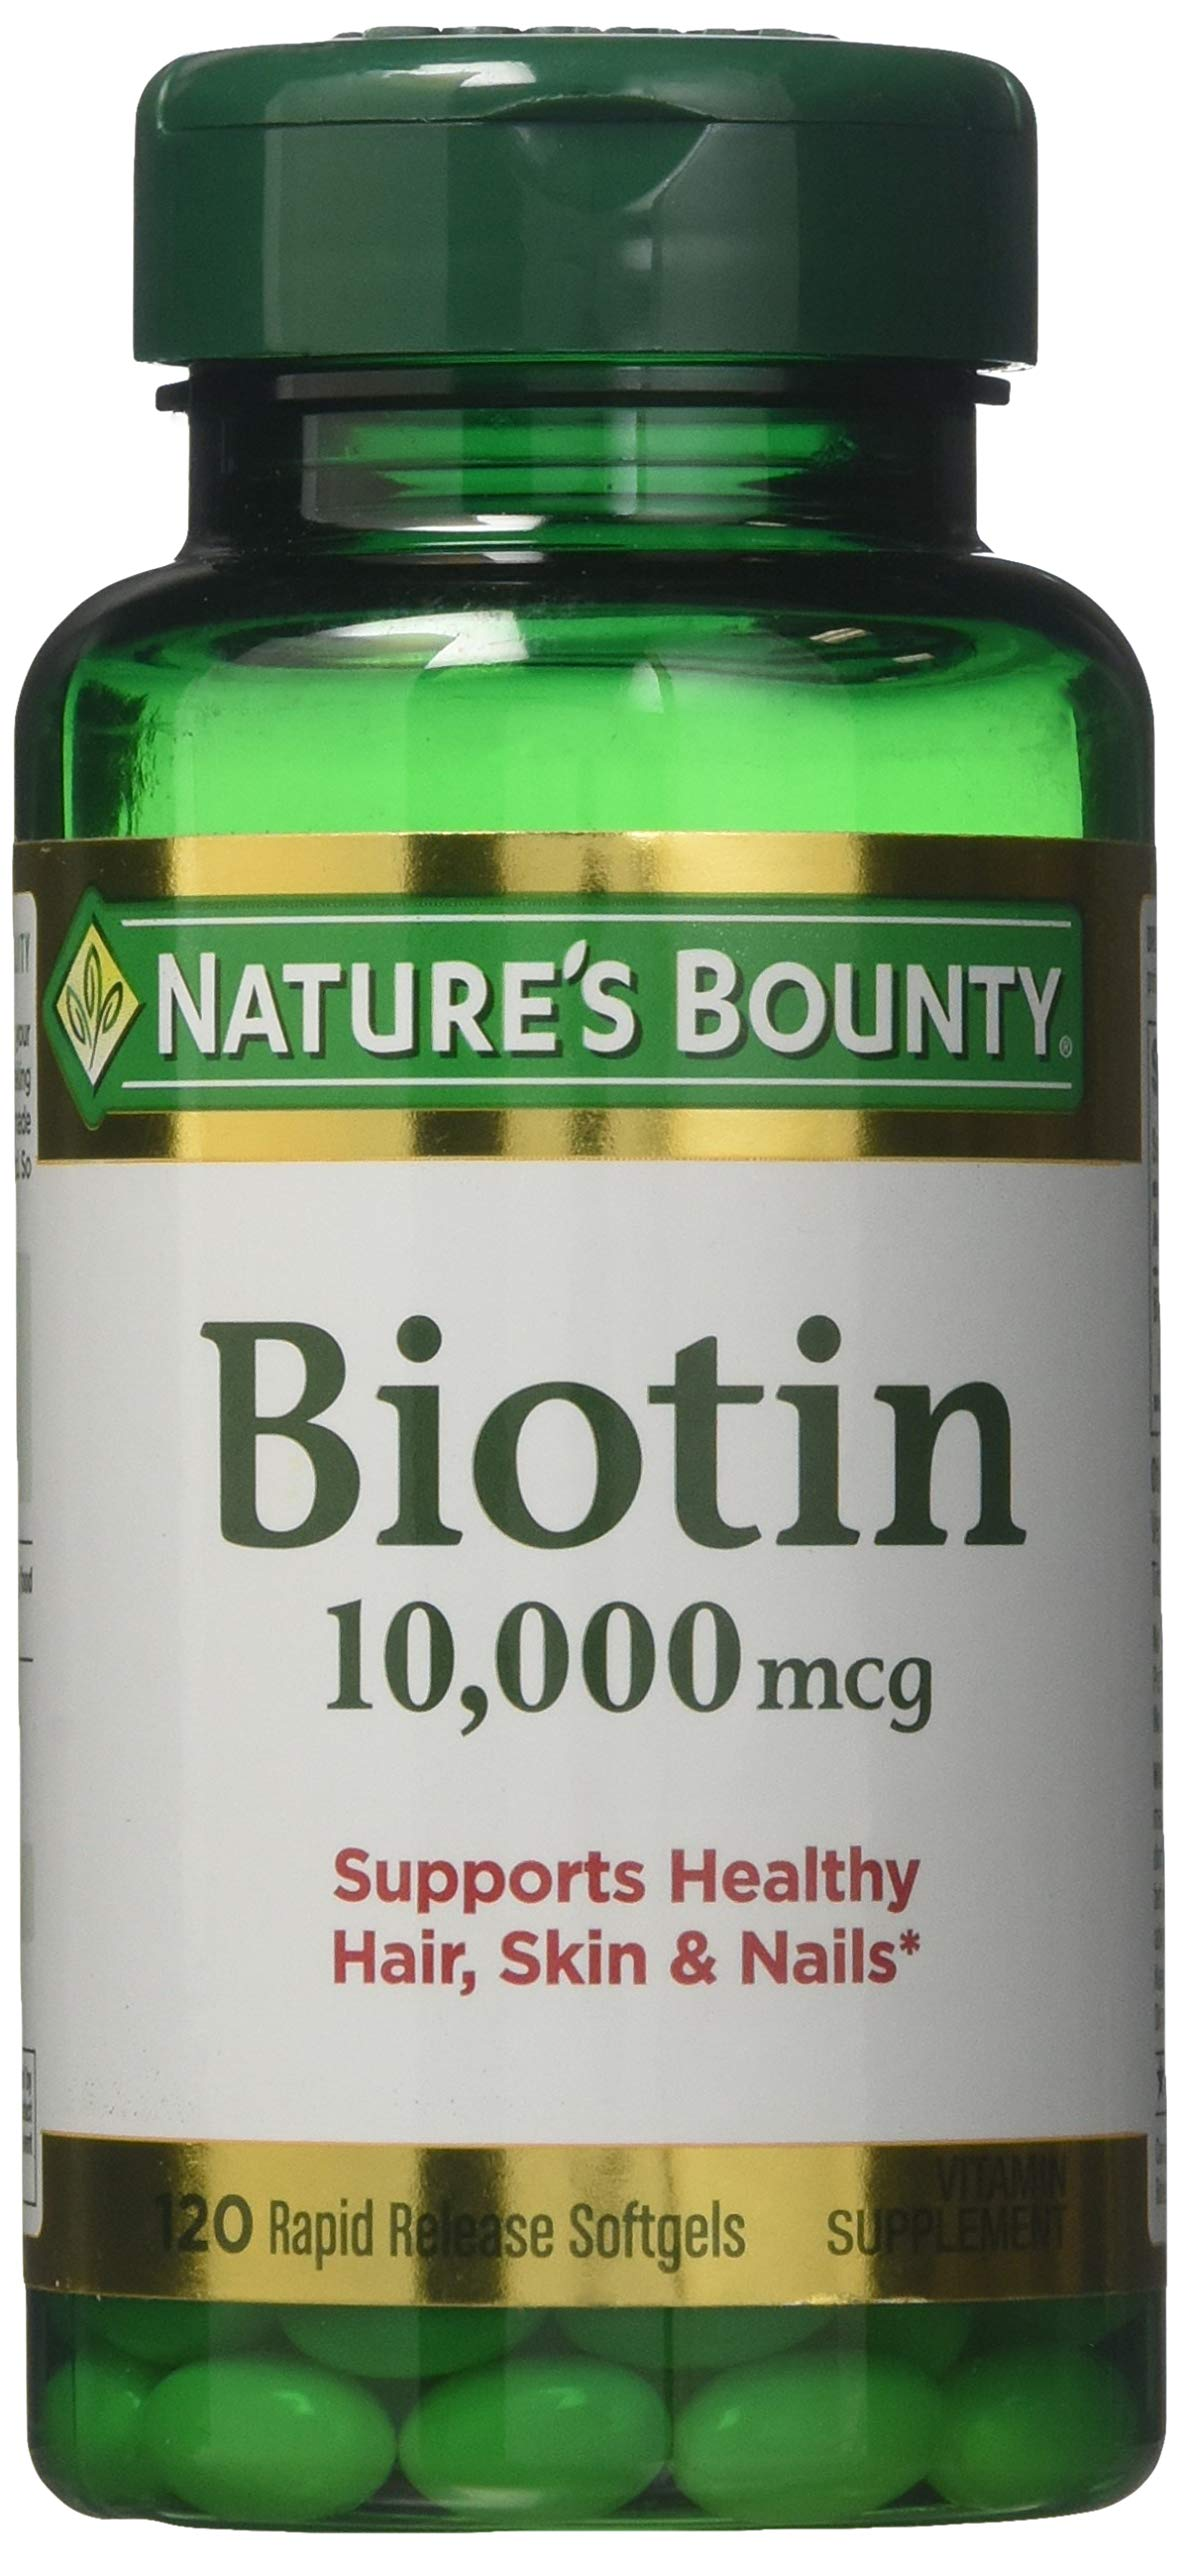 Nature's Bounty Biotin 10,000 mcg, Rapid Release Softgels 120 ea (Pack of 5)